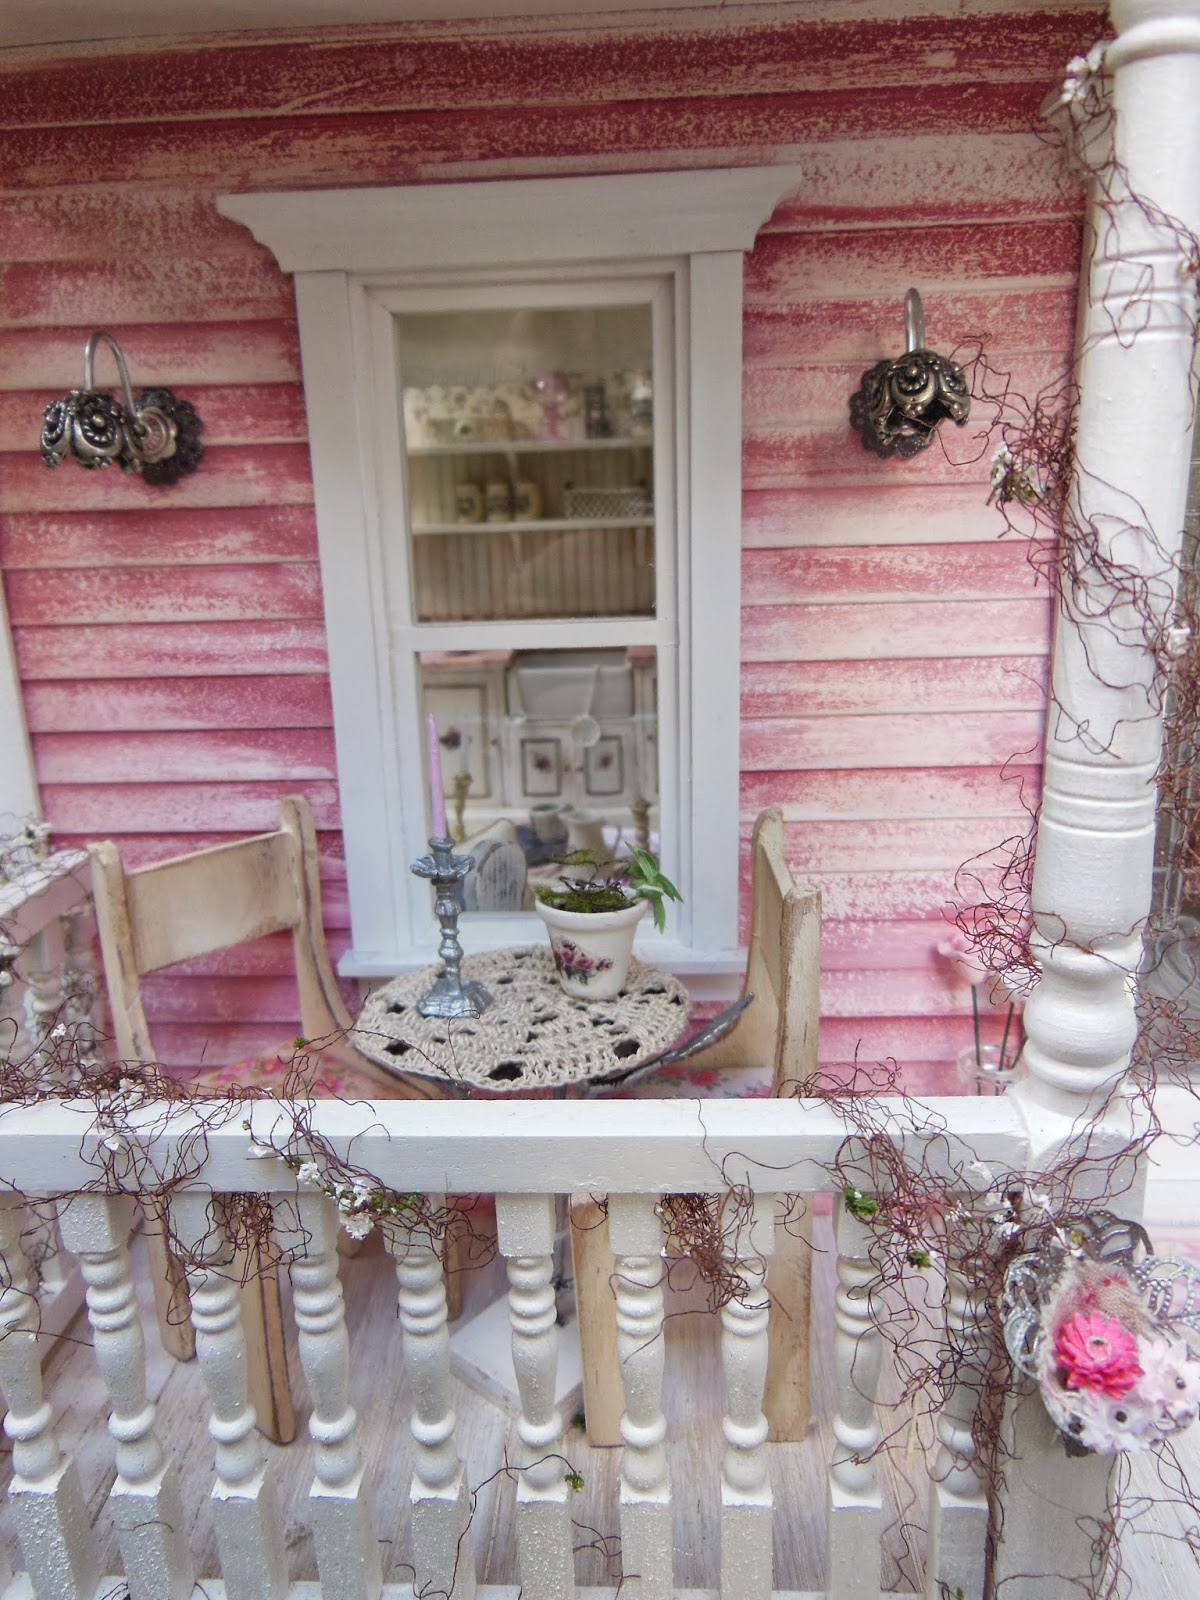 My Mini Hobby Day 92 Shabby Chic Cottage outside photoshoot